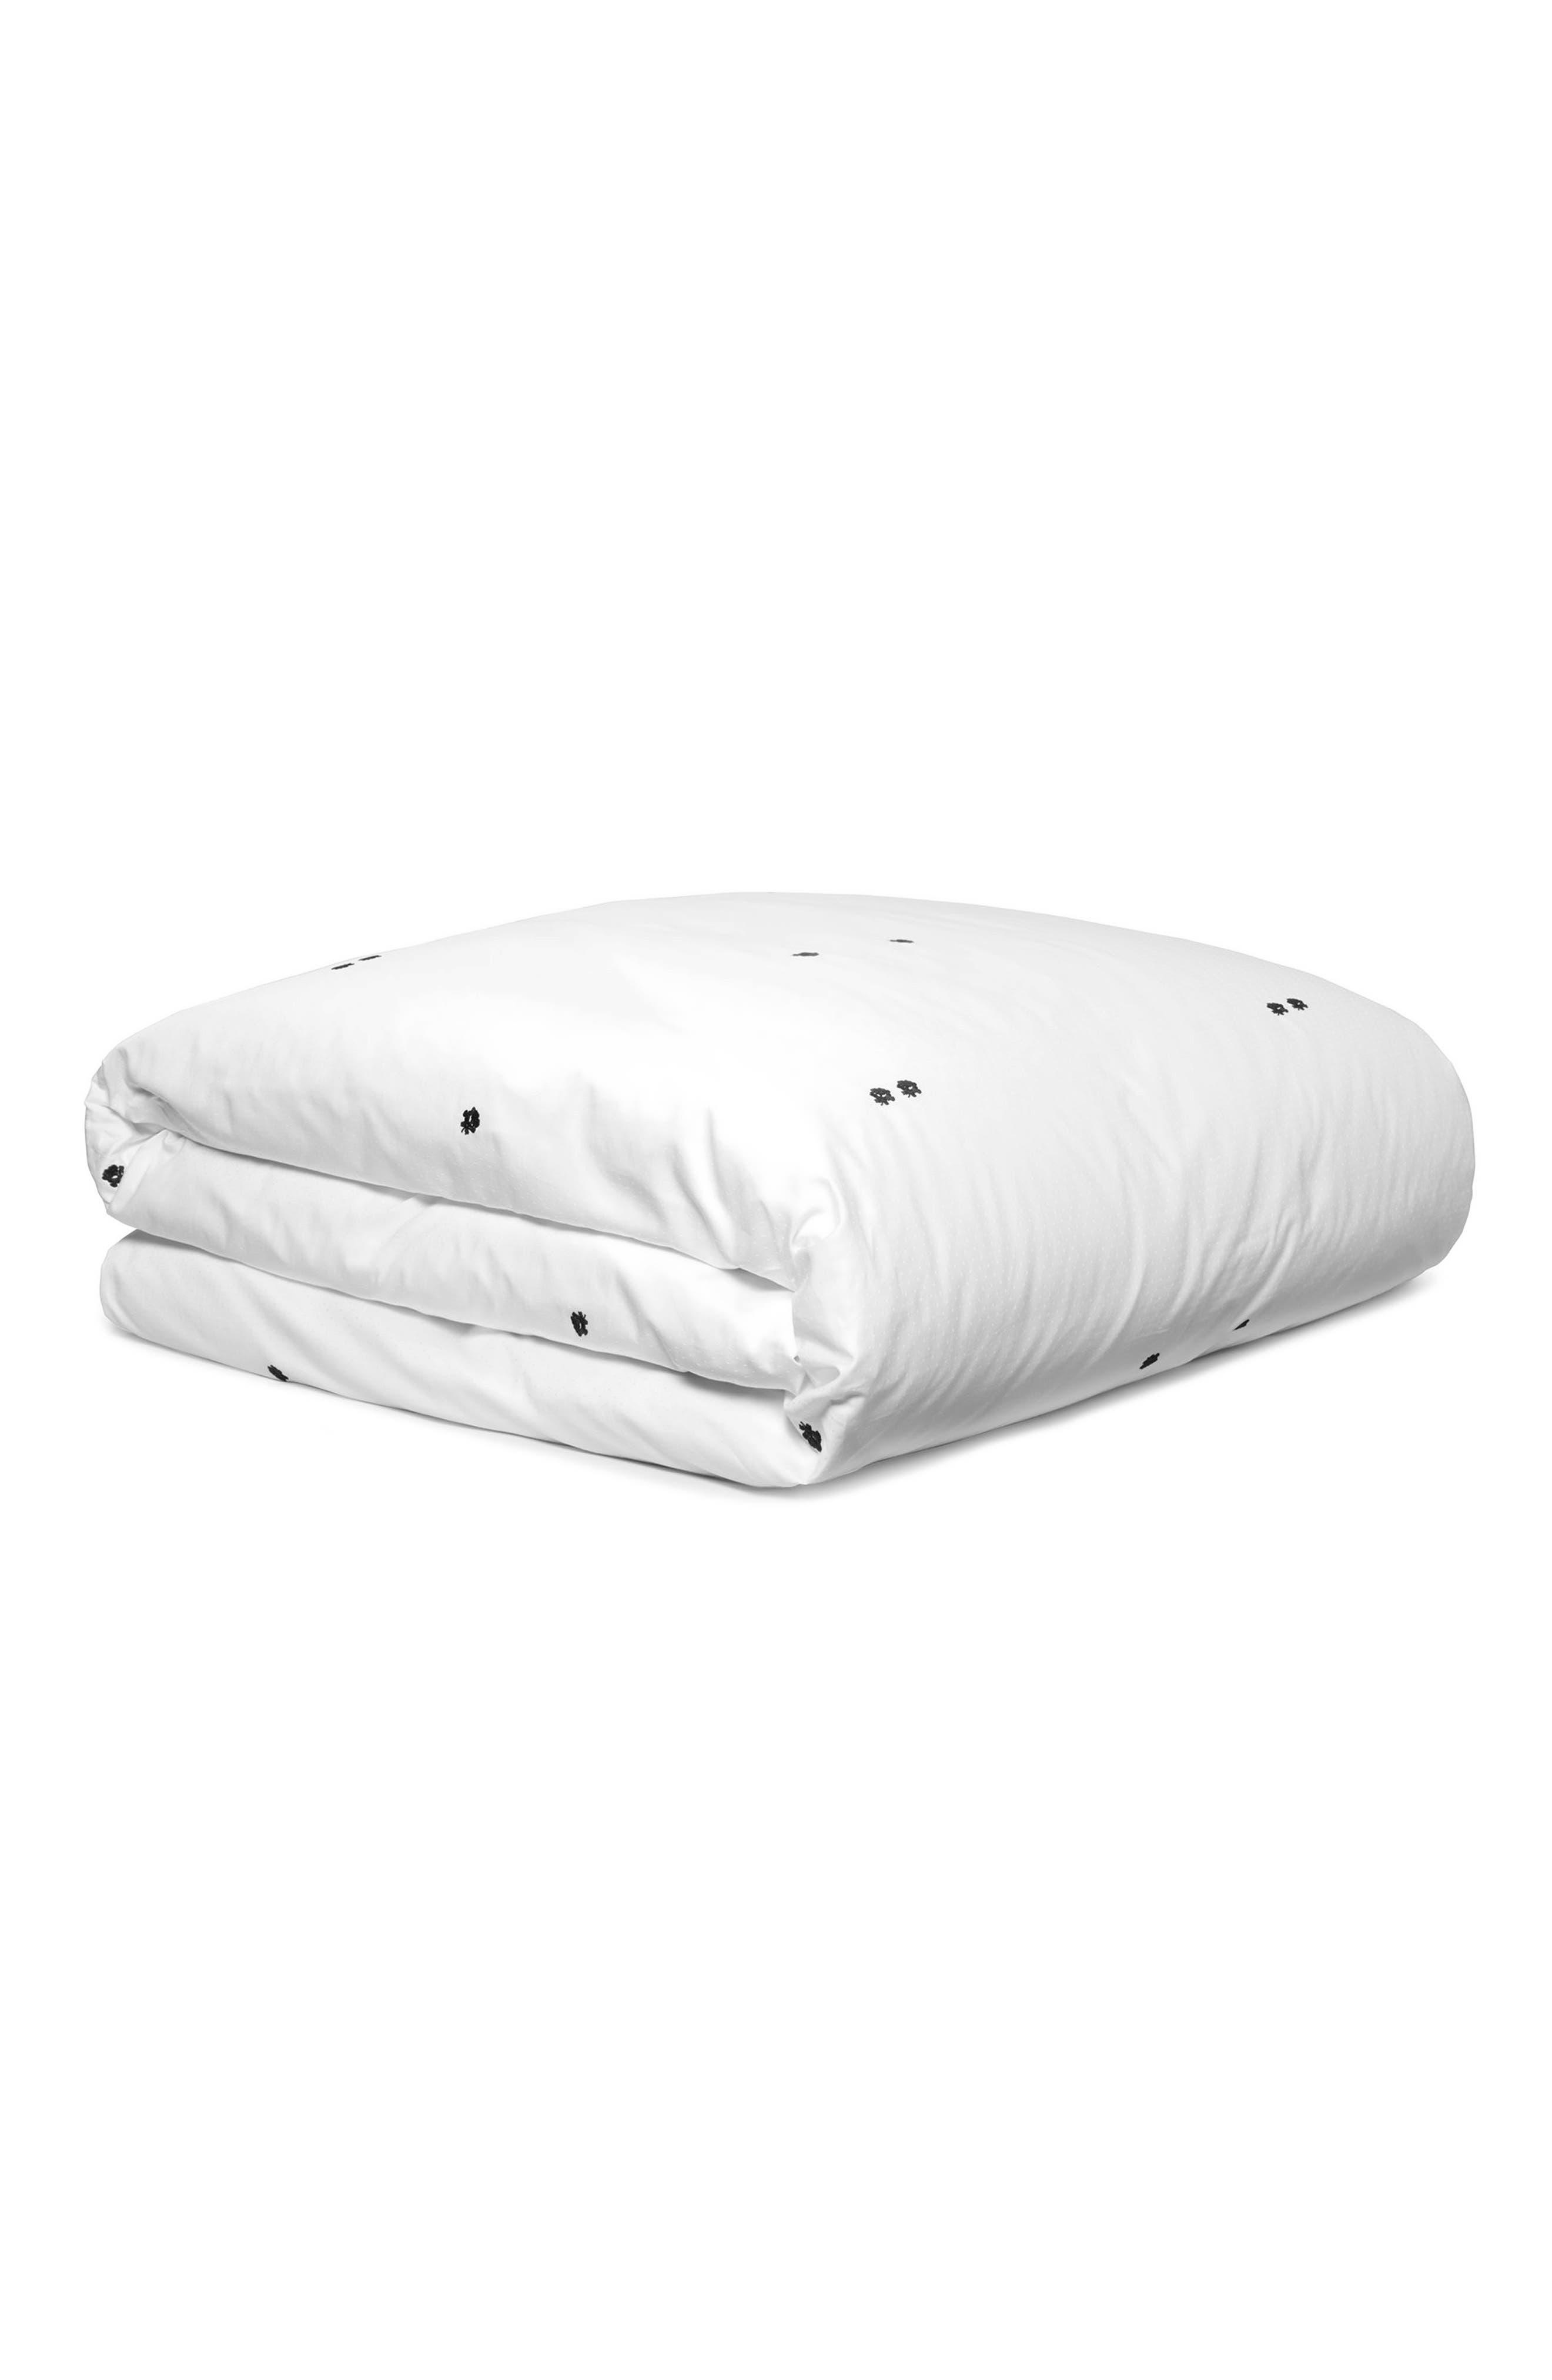 Clone Comforter,                             Main thumbnail 1, color,                             White